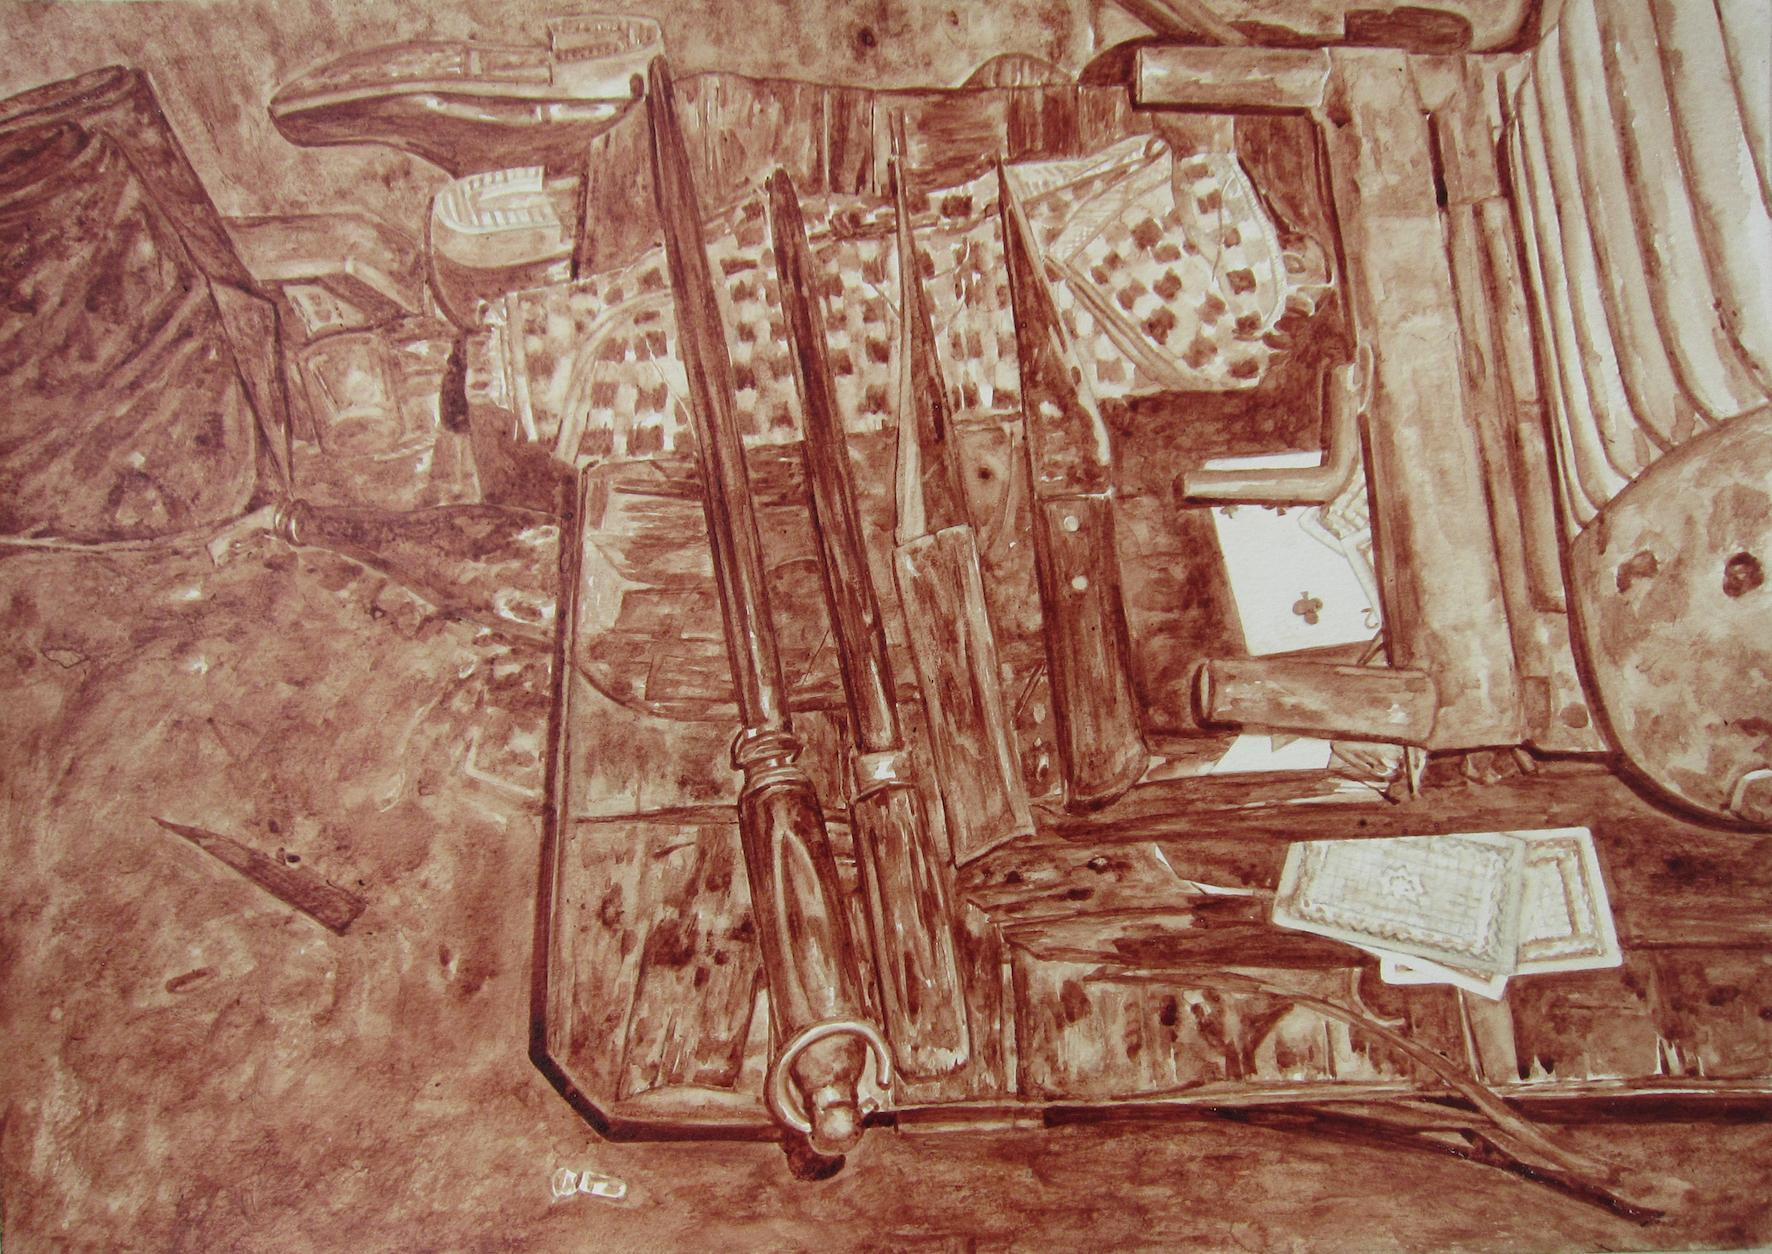 Nguyen Van Du - Slaughter House 14